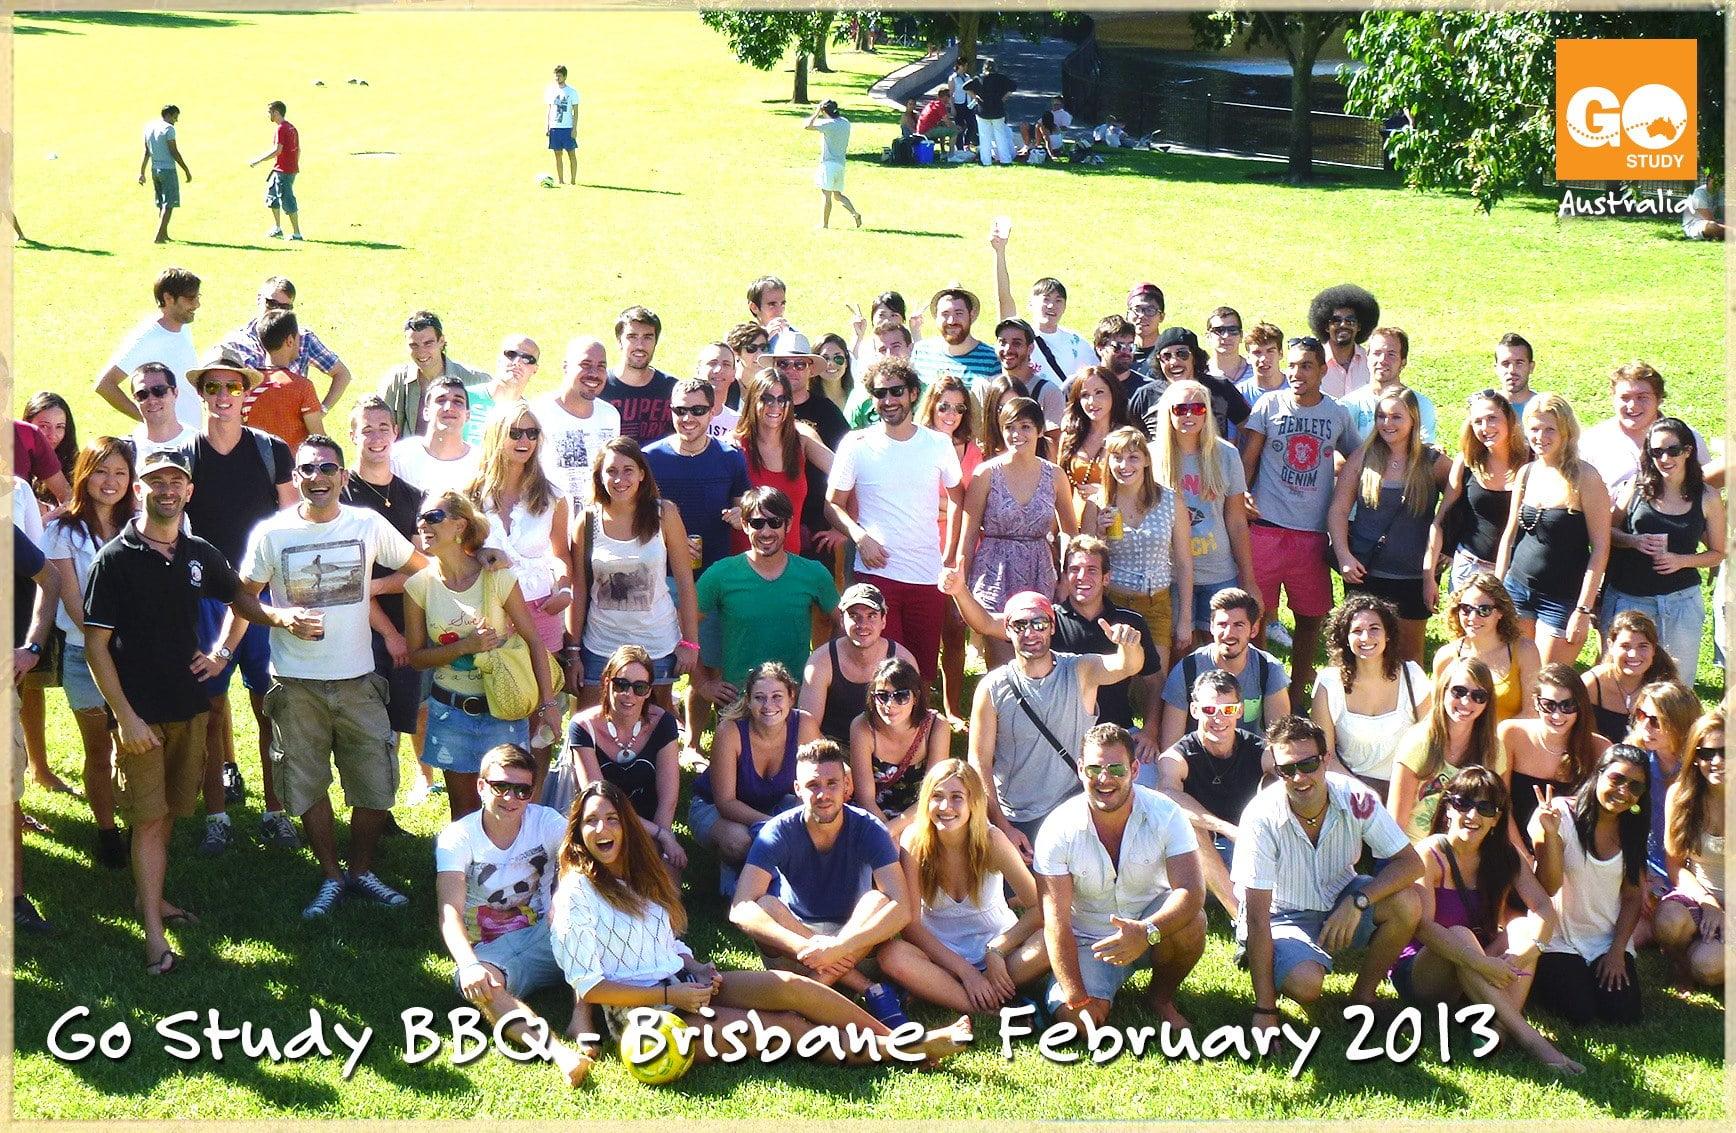 Barbacoa Australia 2013